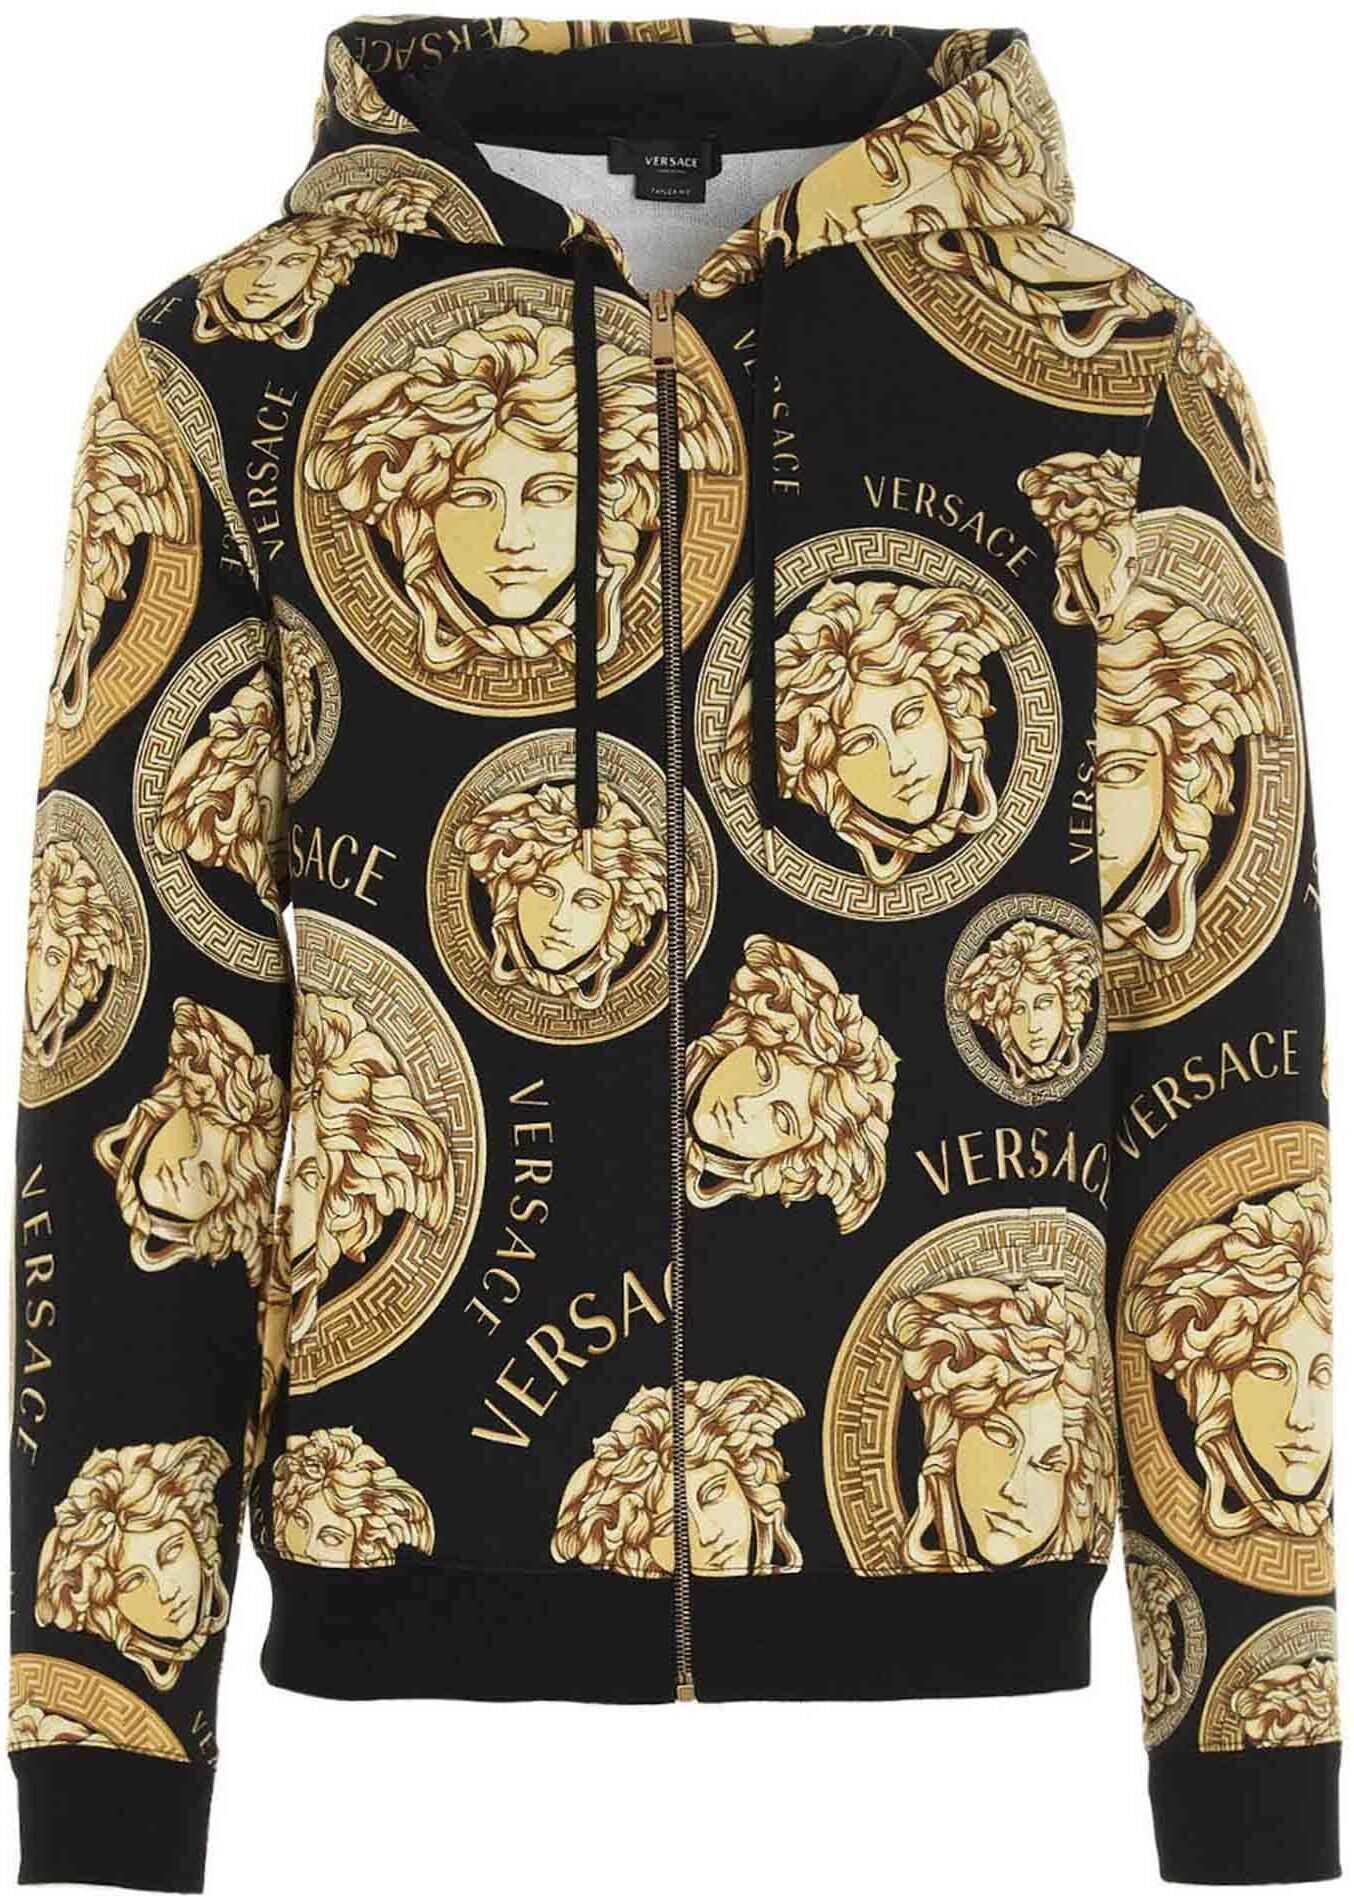 Versace Medusa Print Sweatshirt In Black Black imagine